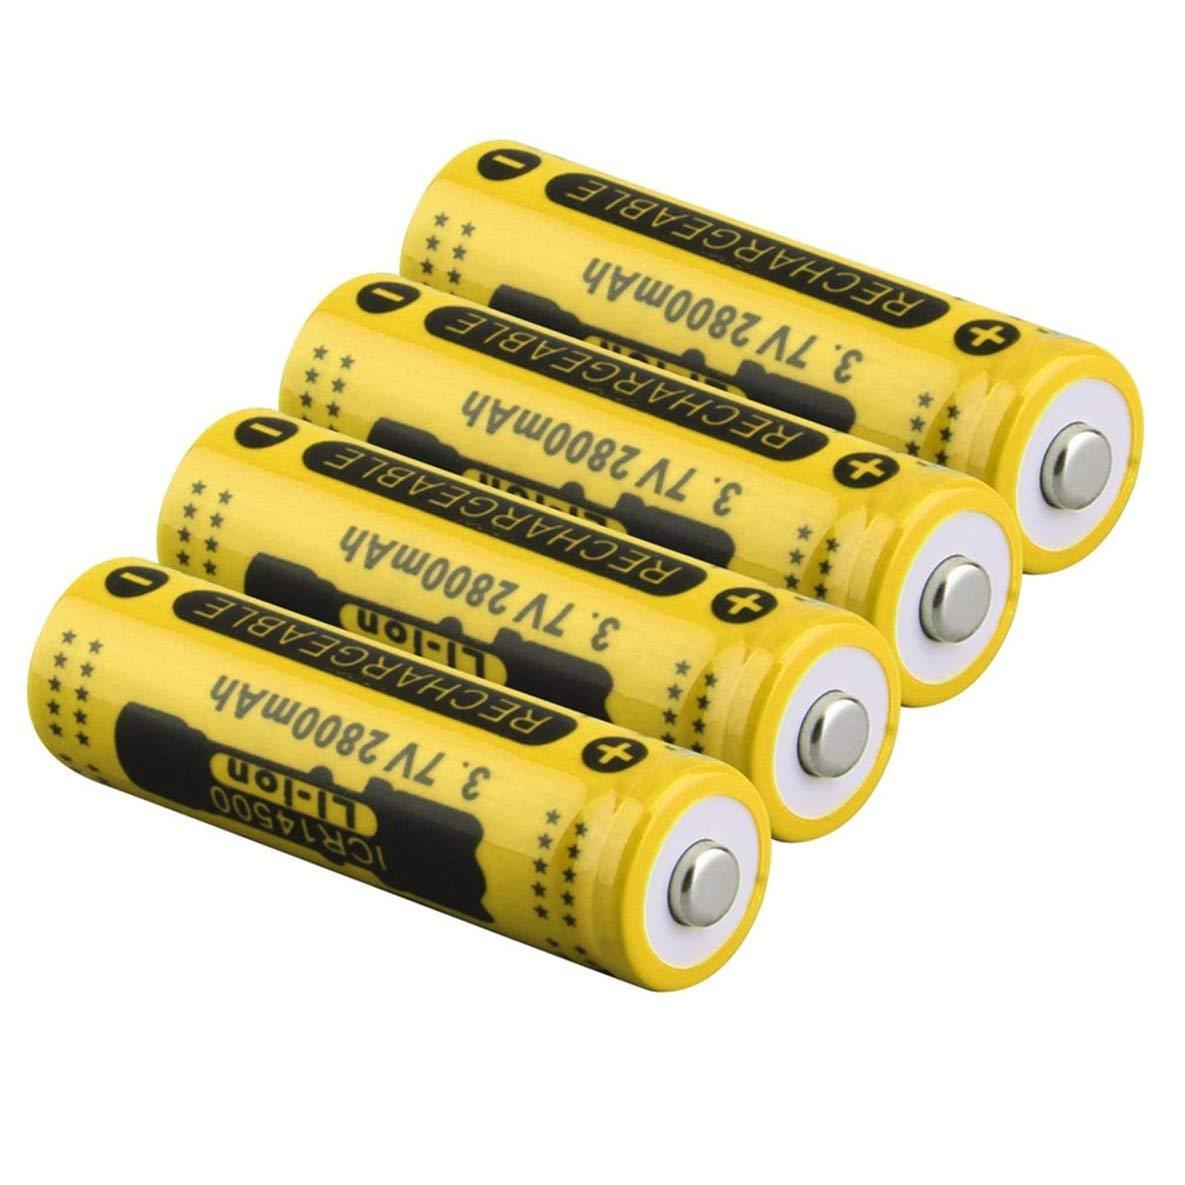 3.7V 2800mAh 14500 Batterie große Kapazität Li-Ion Akku Ersatz für Taschenlampe Batterie Moliies